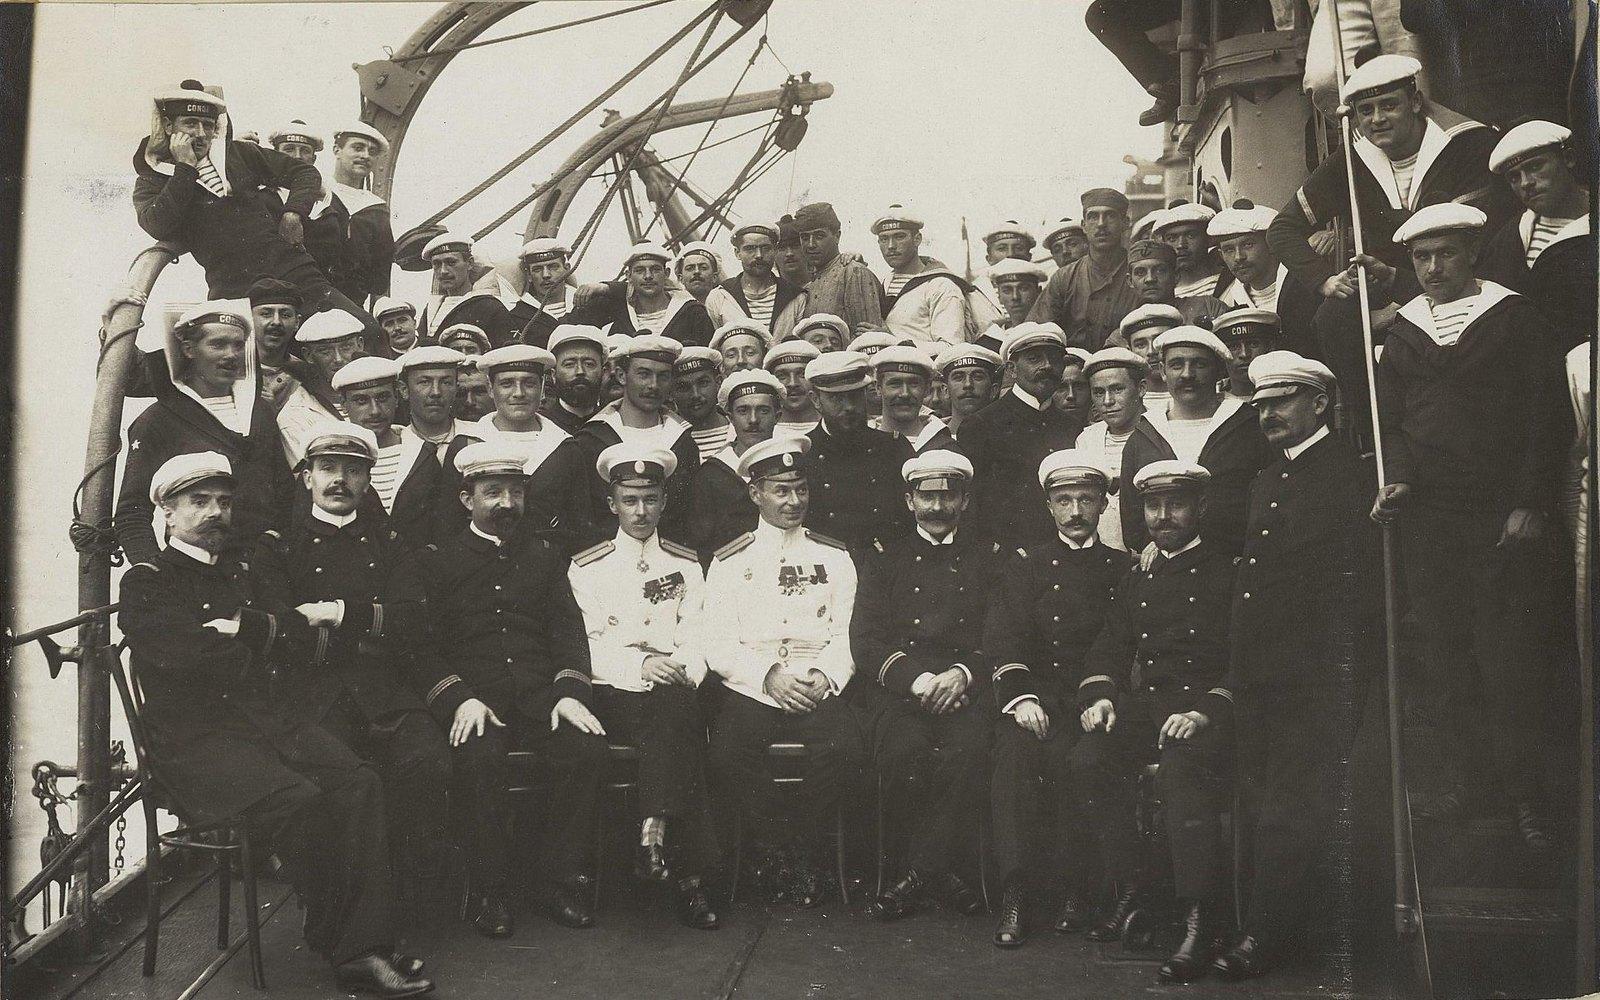 16. Команда учебного судна «Океан». 1901-1902 гг.